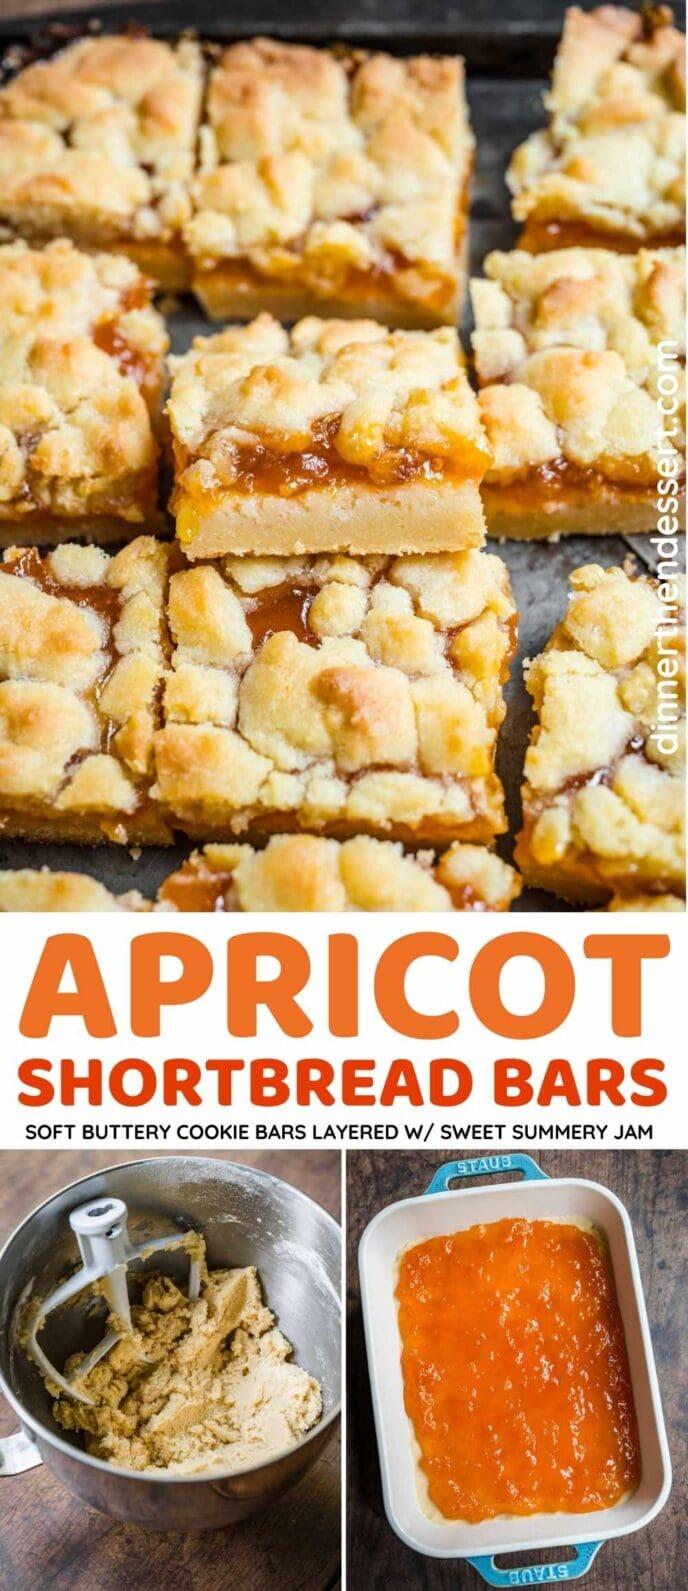 Apricot Shortbread Bars Collage